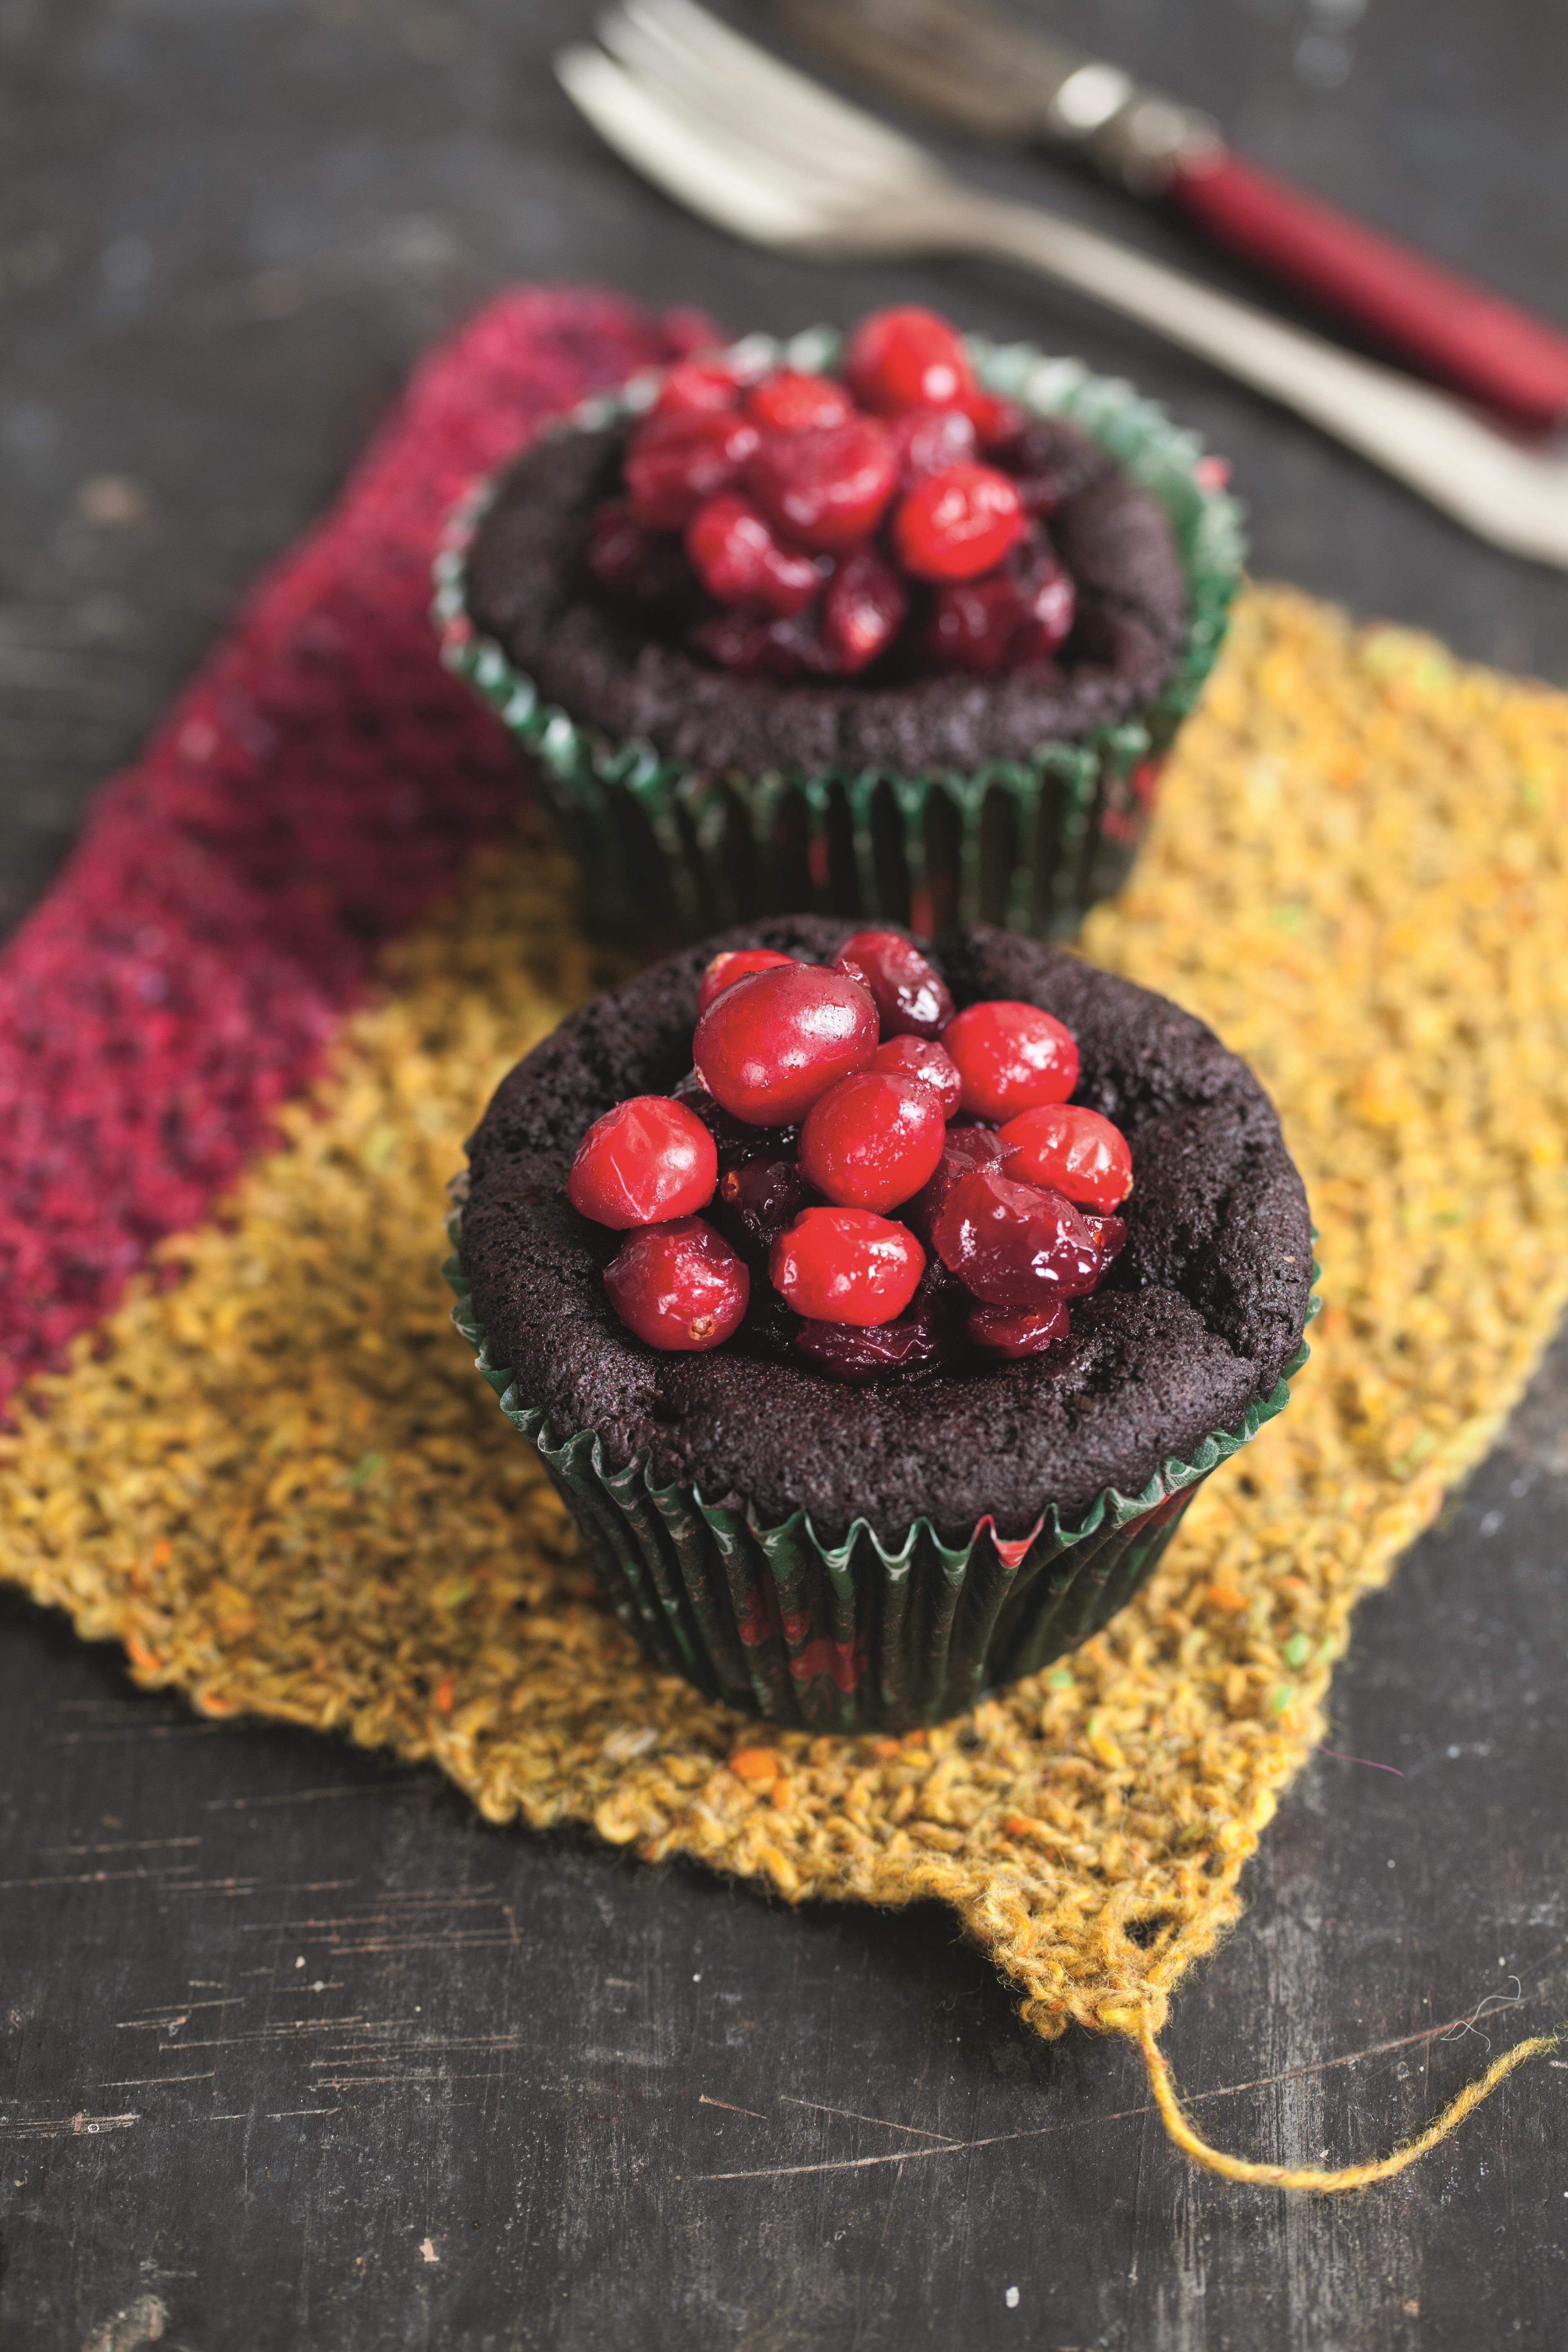 Chocolate, Aubergine & Cranberry Cakes - (Gluten-Free/Dairy-Free)